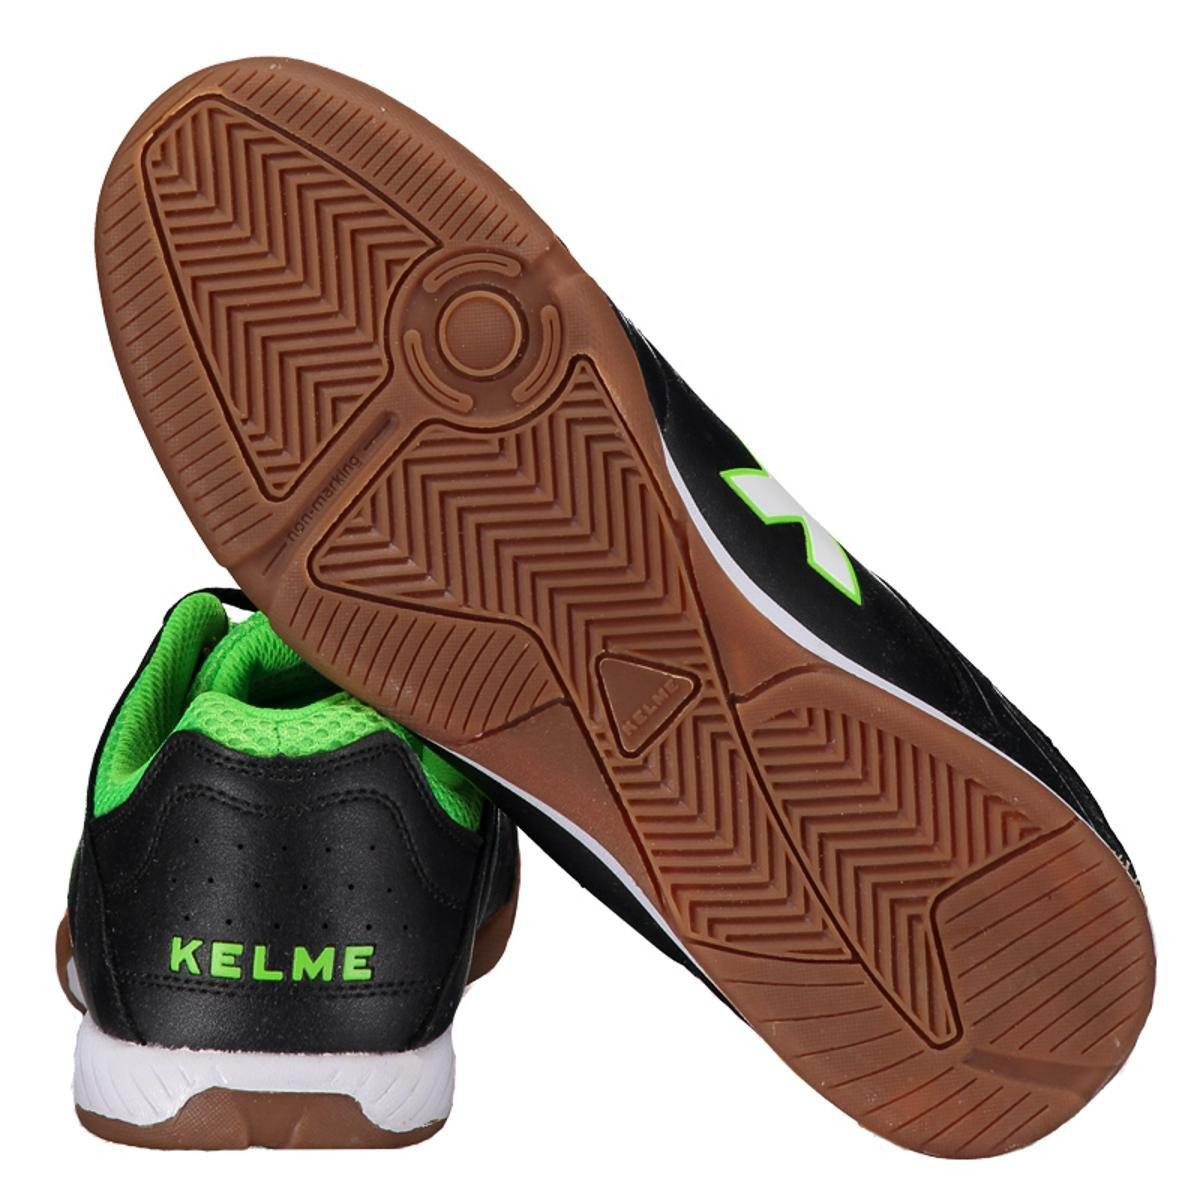 be4b52d2abe Chuteira Kelme Precision Trn Futsal  Chuteira Kelme Precision Trn Futsal ...